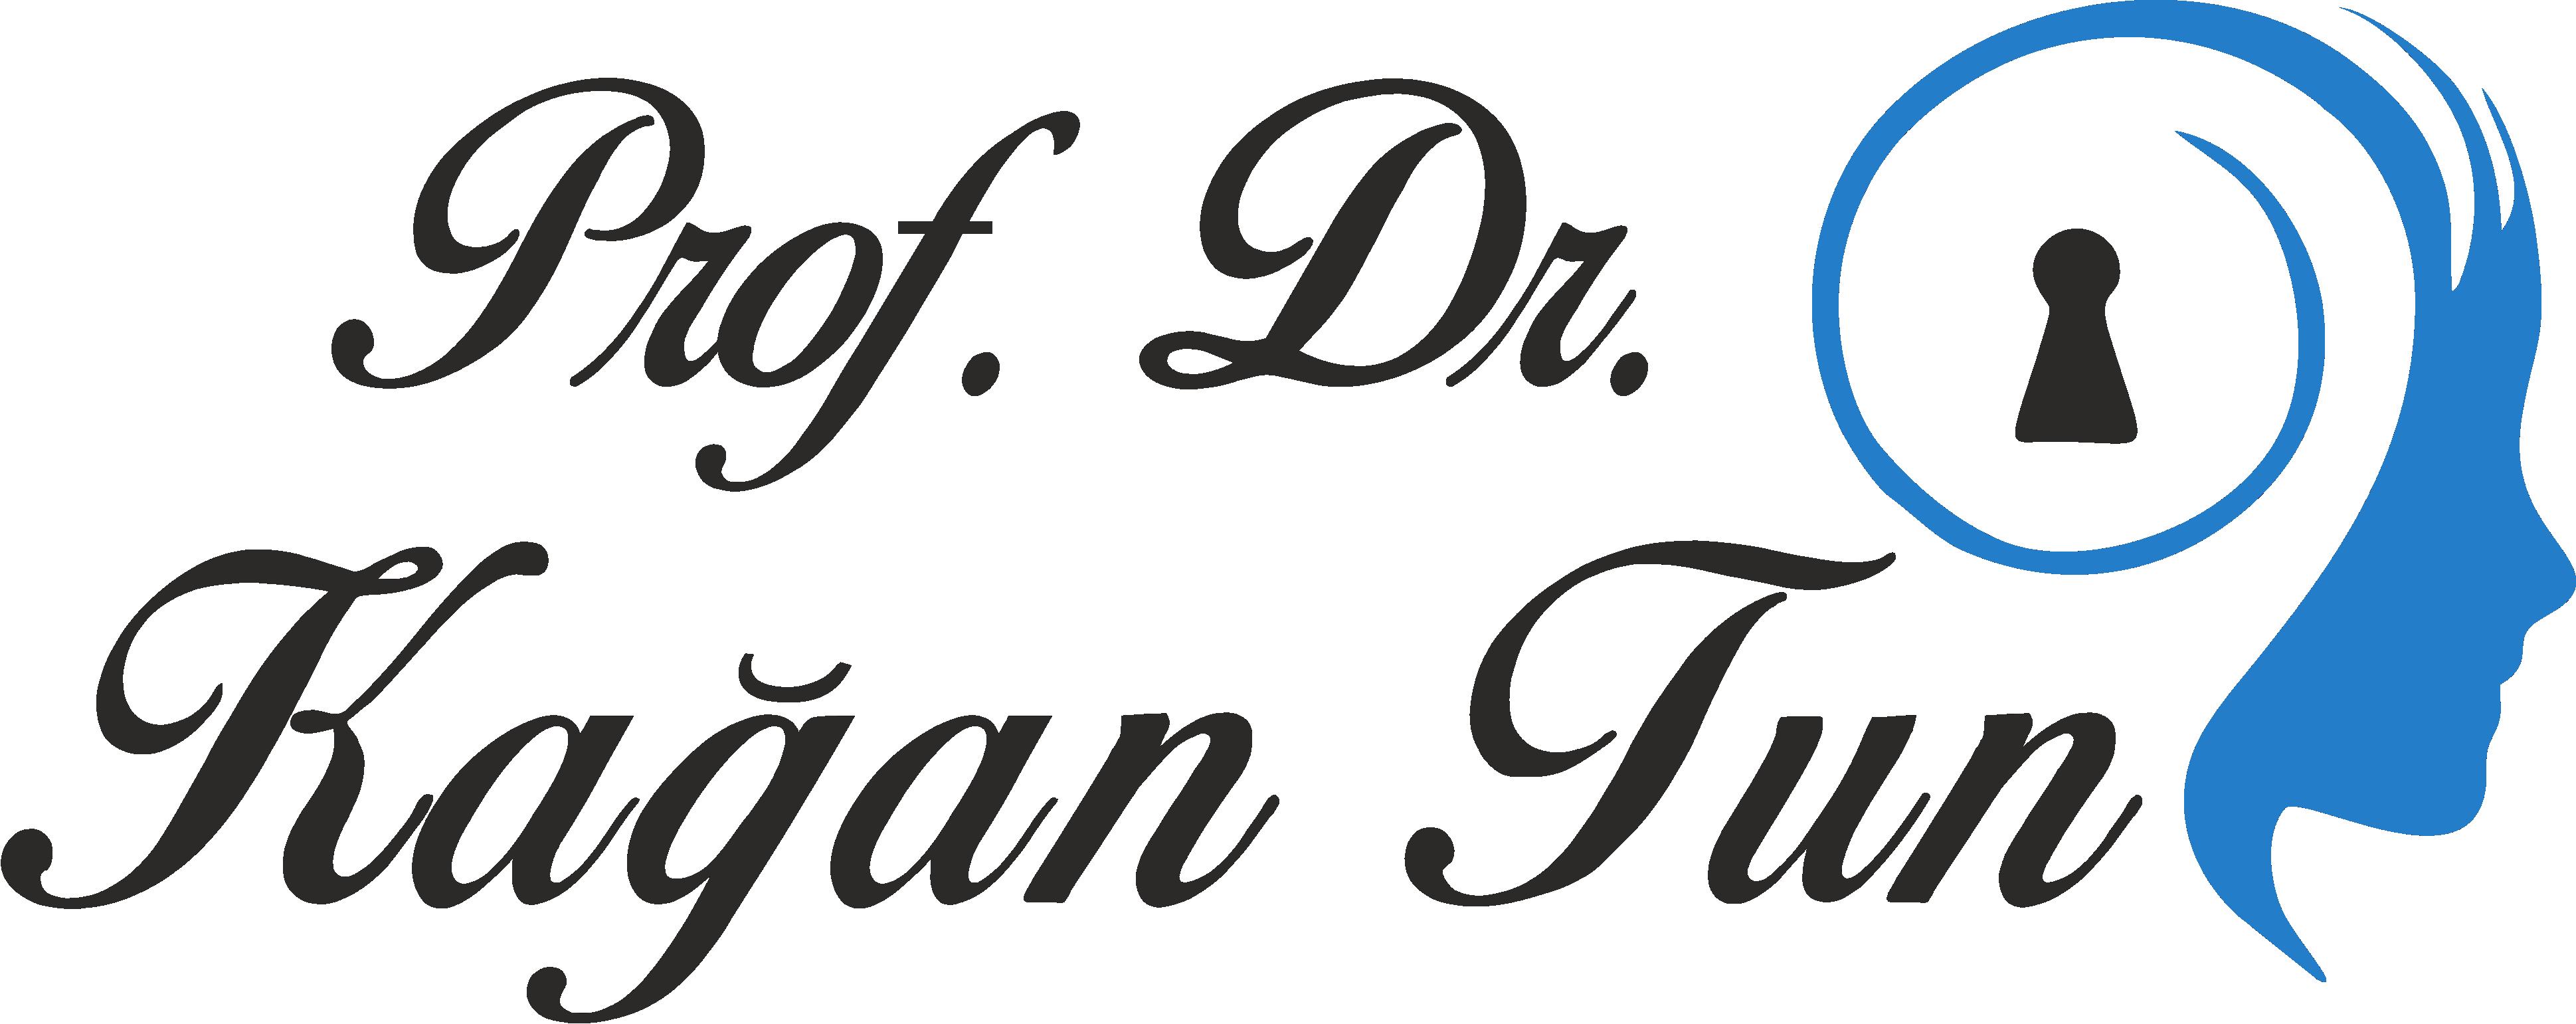 https://drkagantun.com